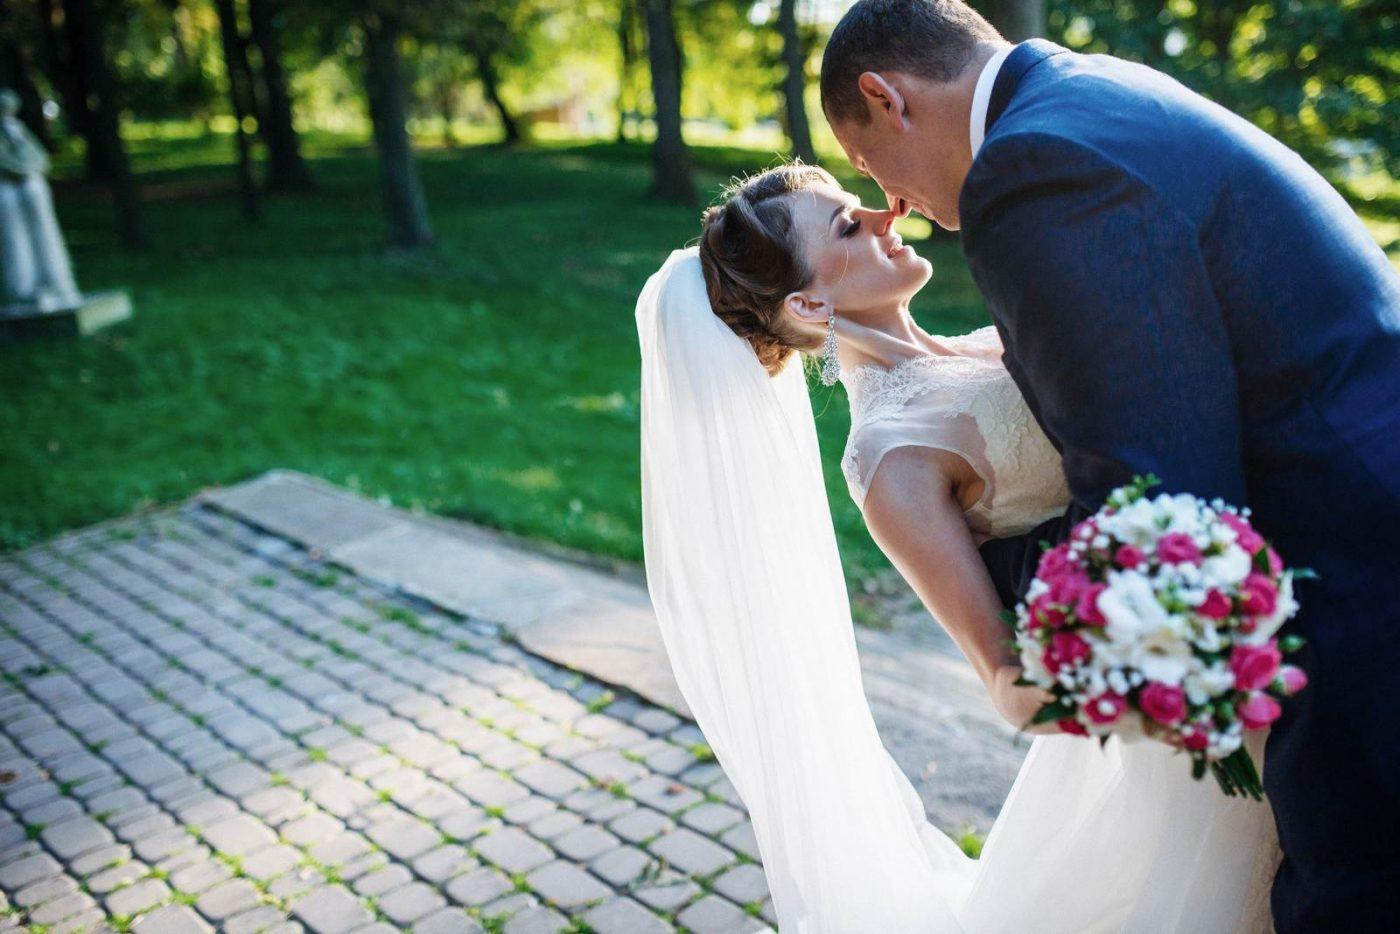 Denver wedding videographers